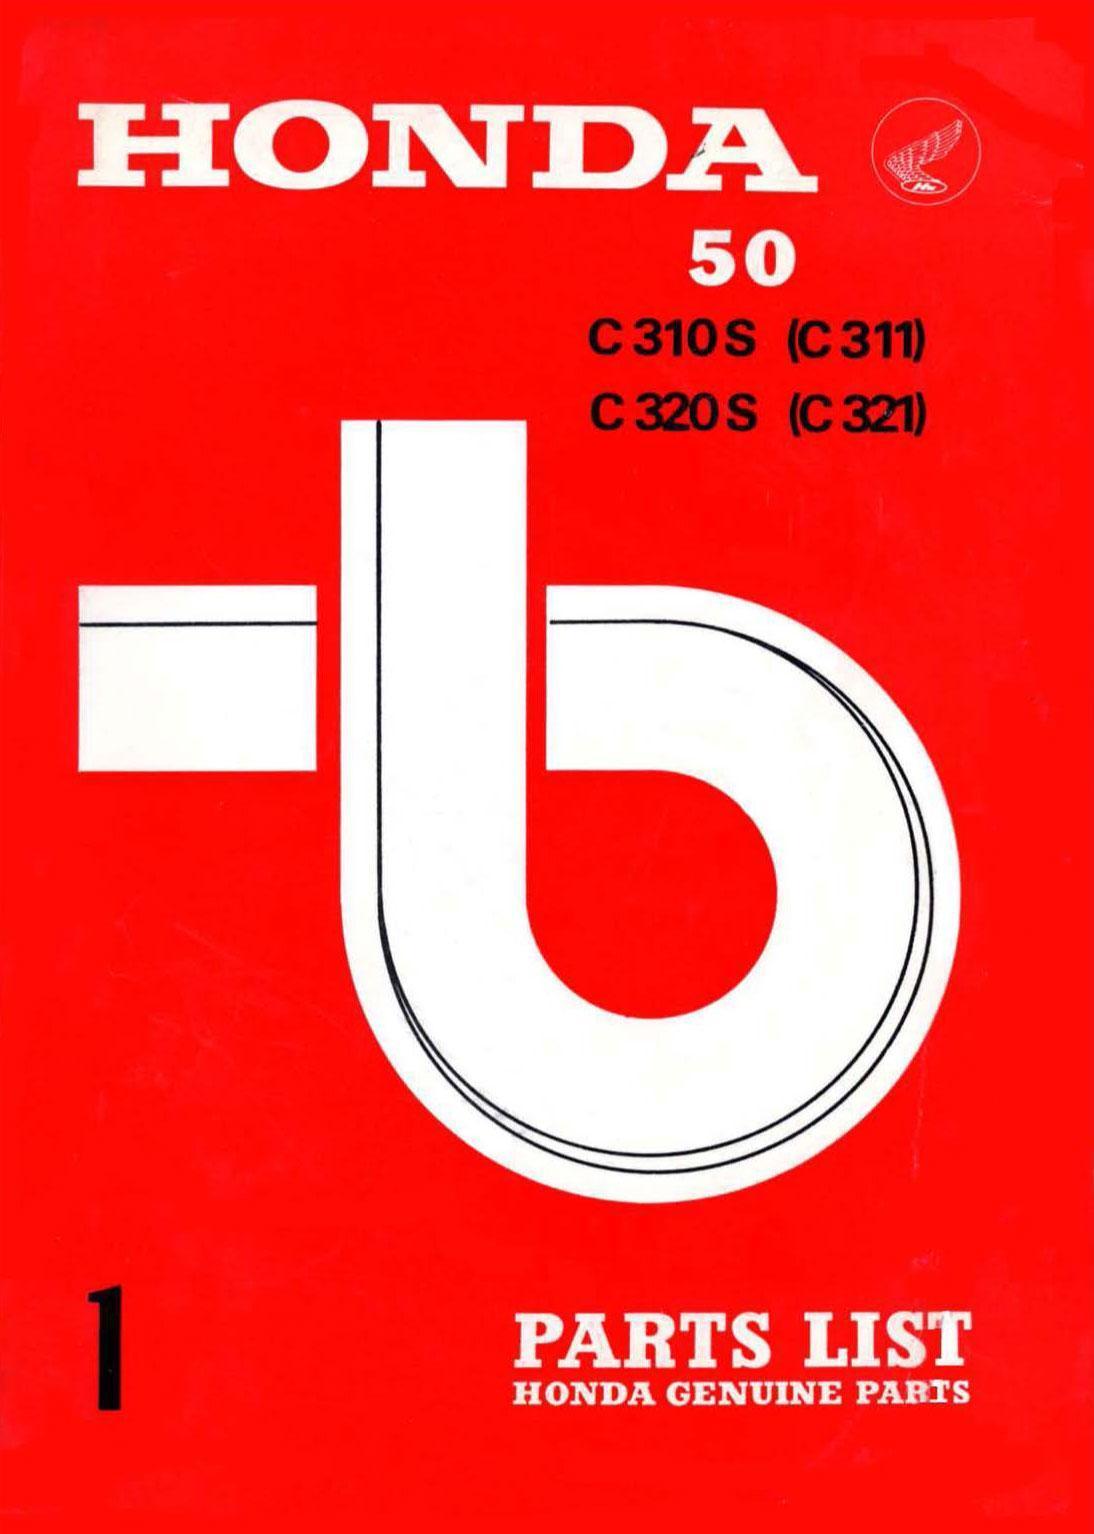 Parts List for Honda C320S (1967)